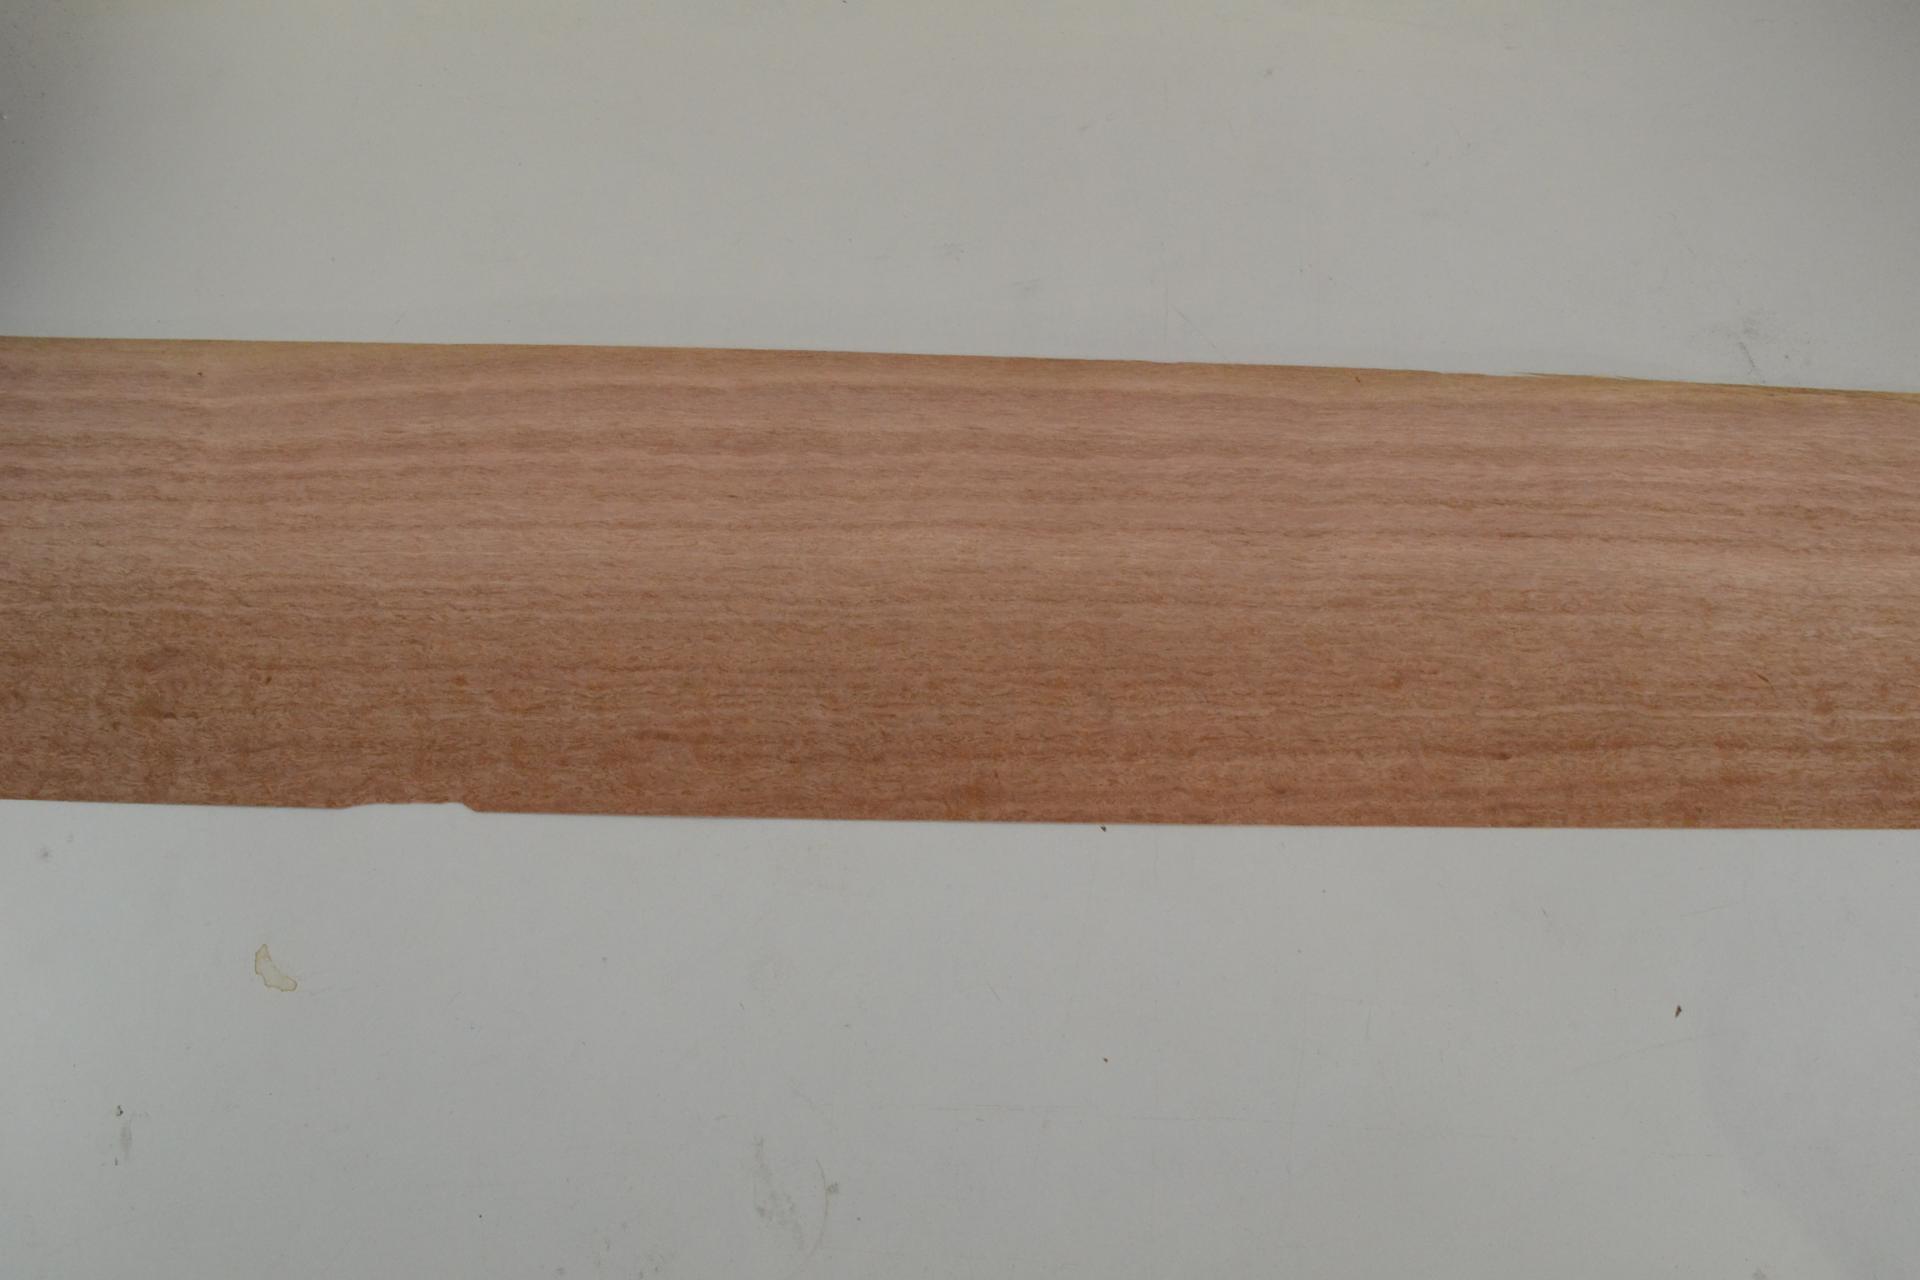 381 placage feuille de bois loupe d eucalyptus 1 1